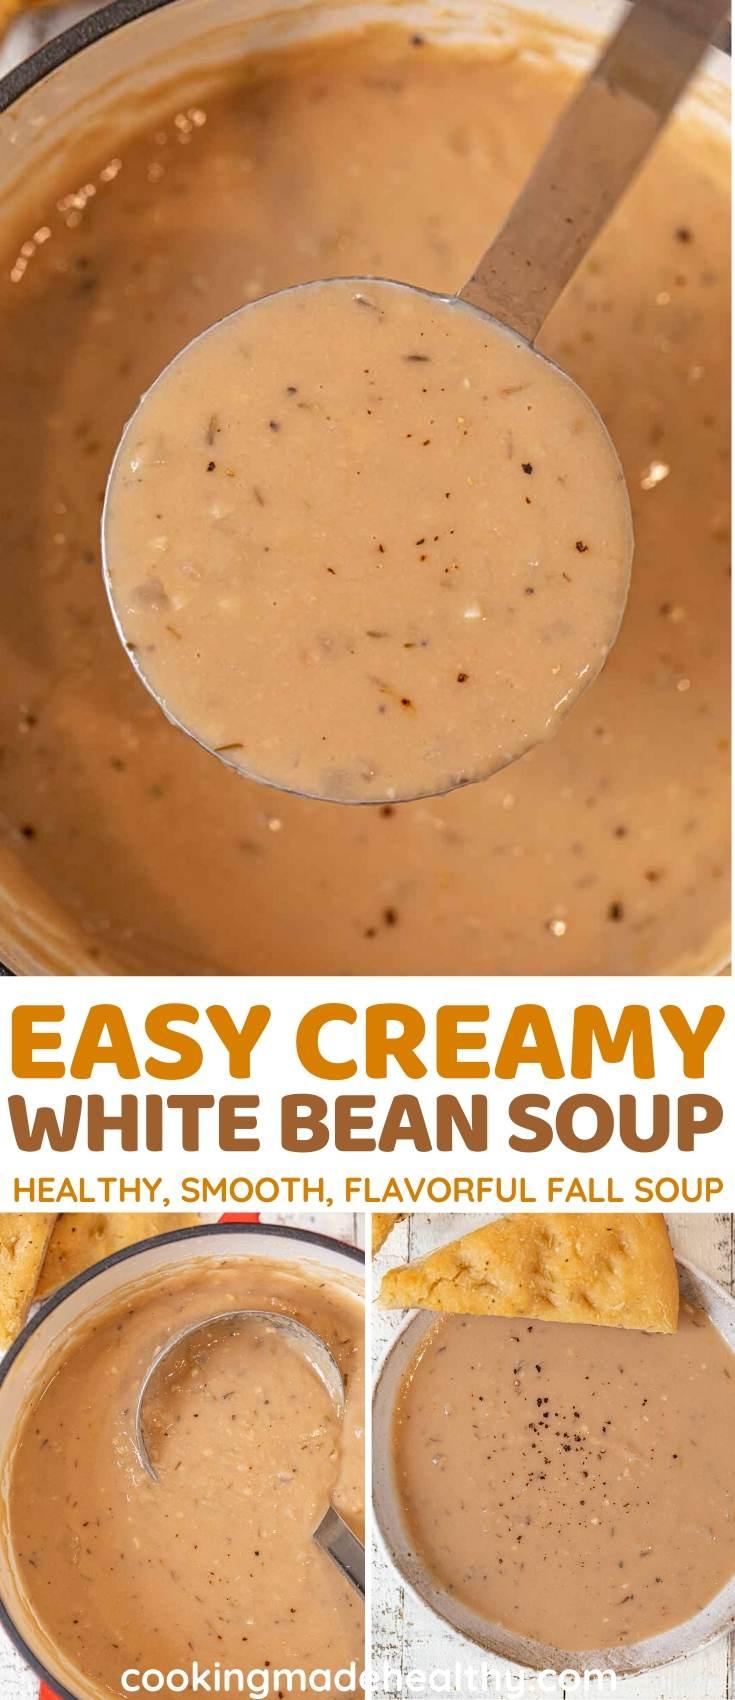 White Bean Soup collage